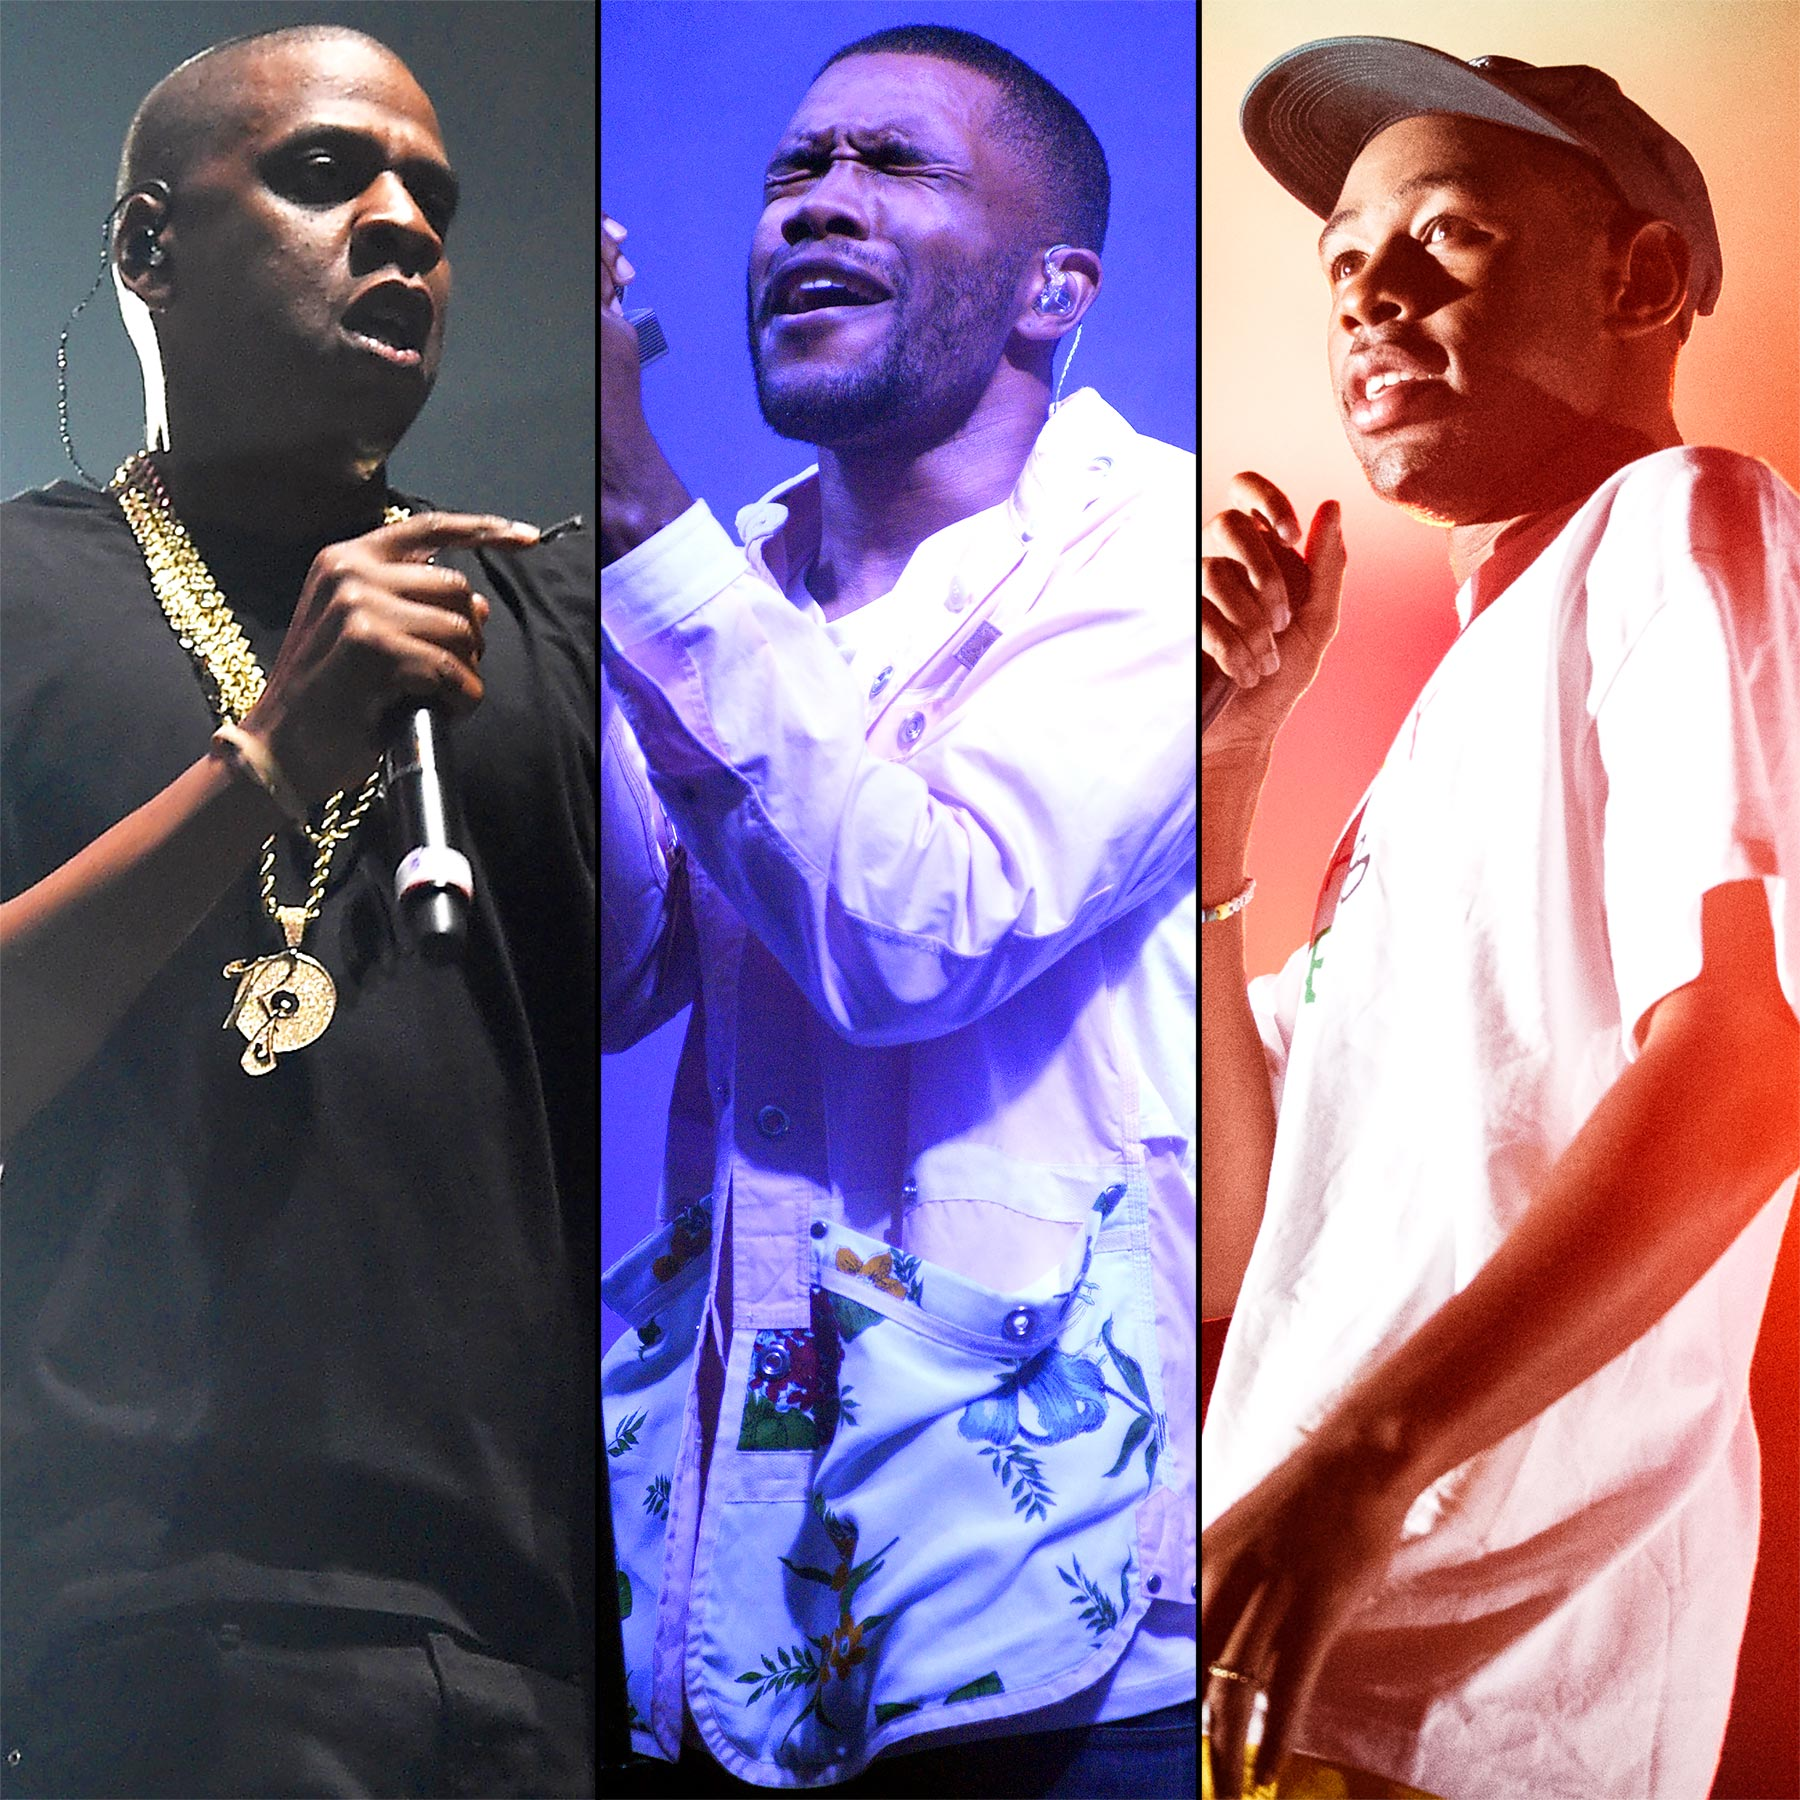 Jay-Z-Frank-Ocean-Tyler-the-Creator